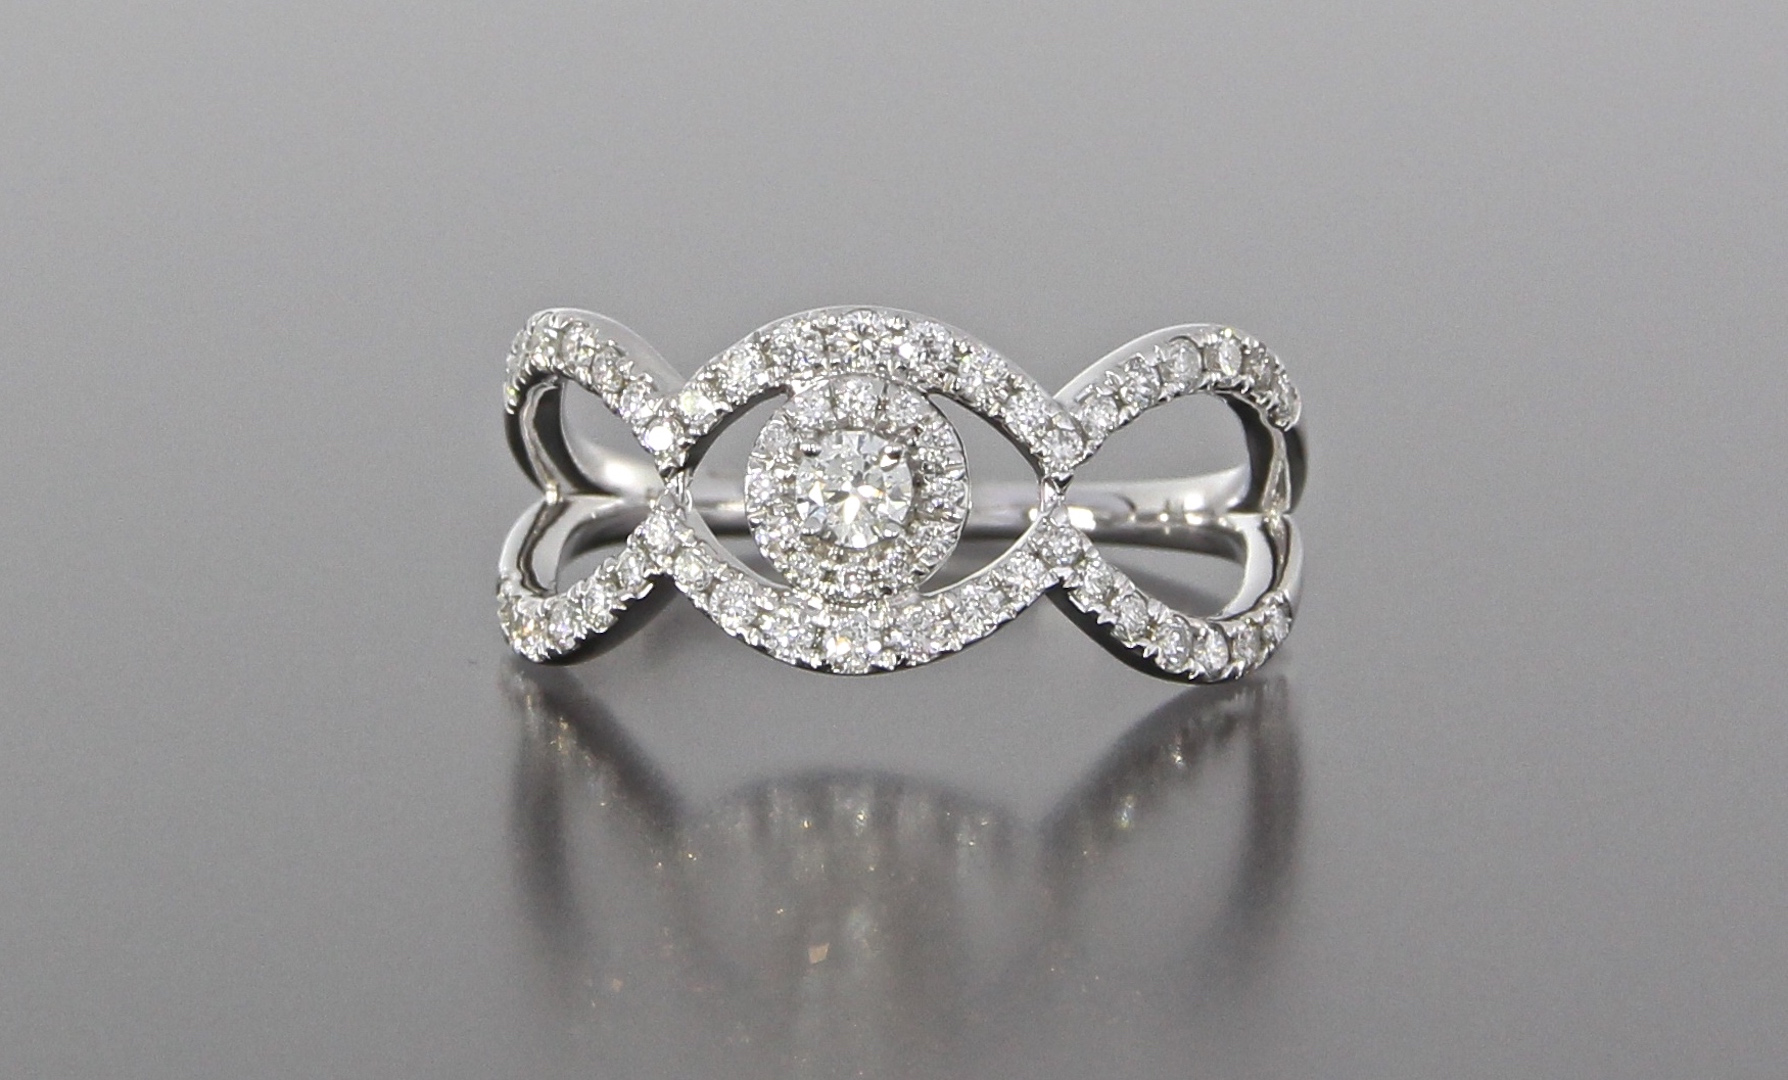 unique-delicate-ladies-diamond-engagement-ring-craft-revival-jewelry-store-grand-rapids